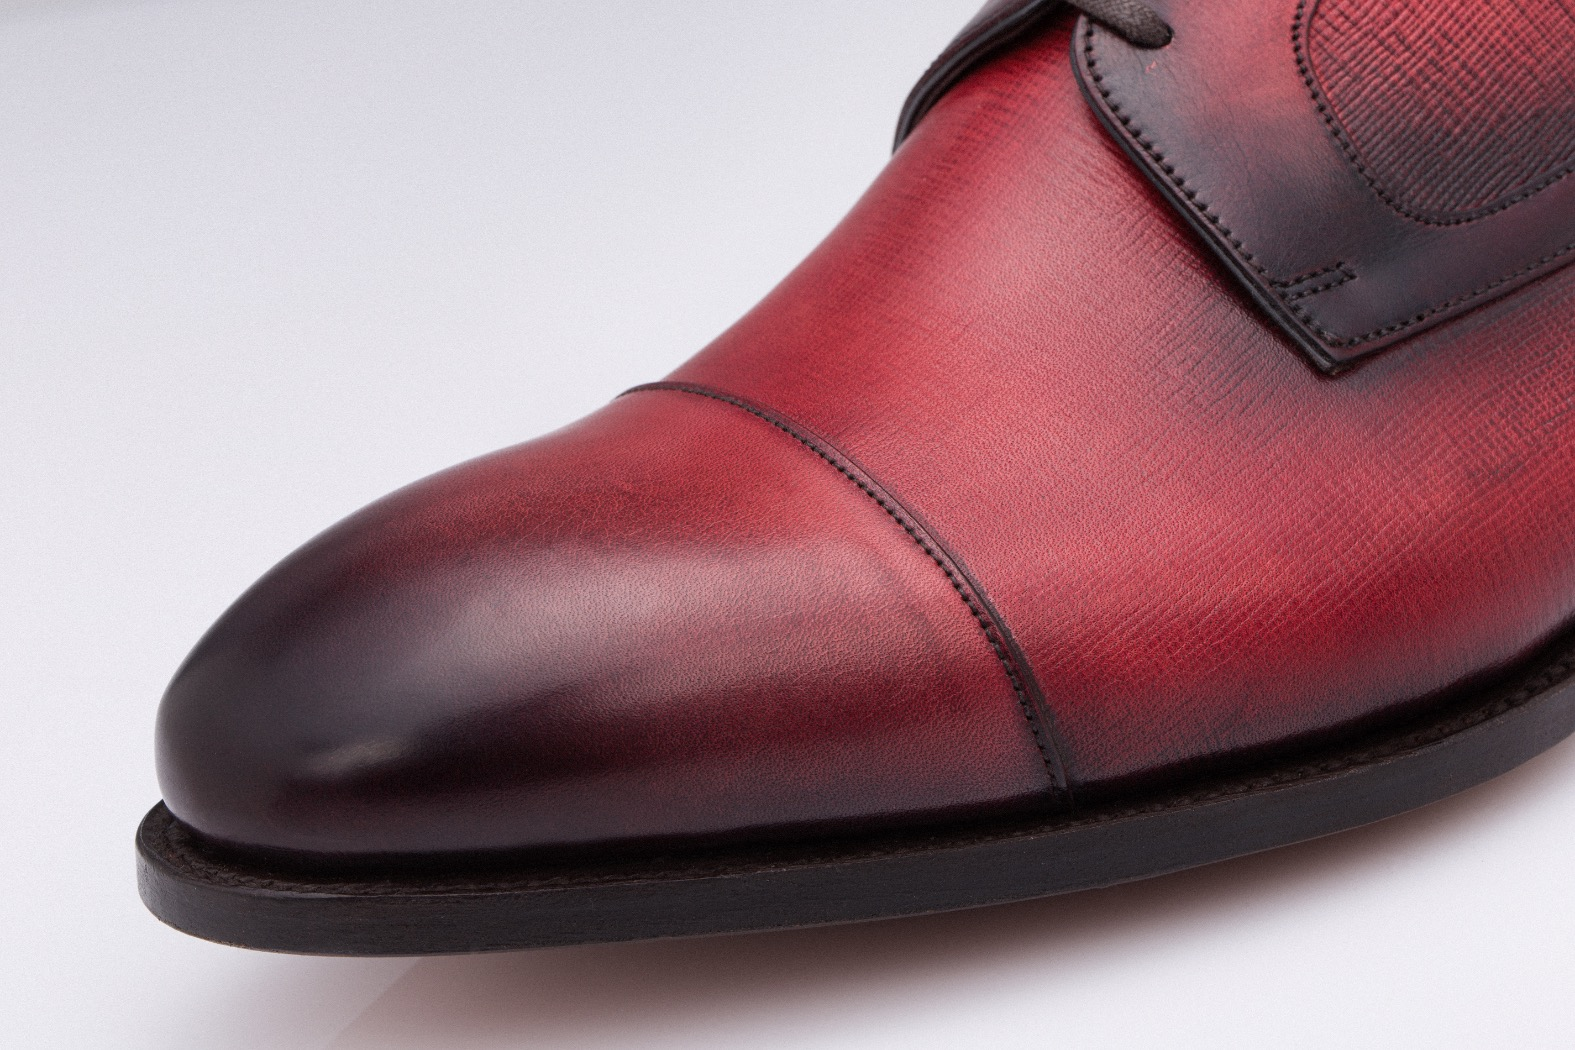 Consiglieri_shoes_studio_28.jpg